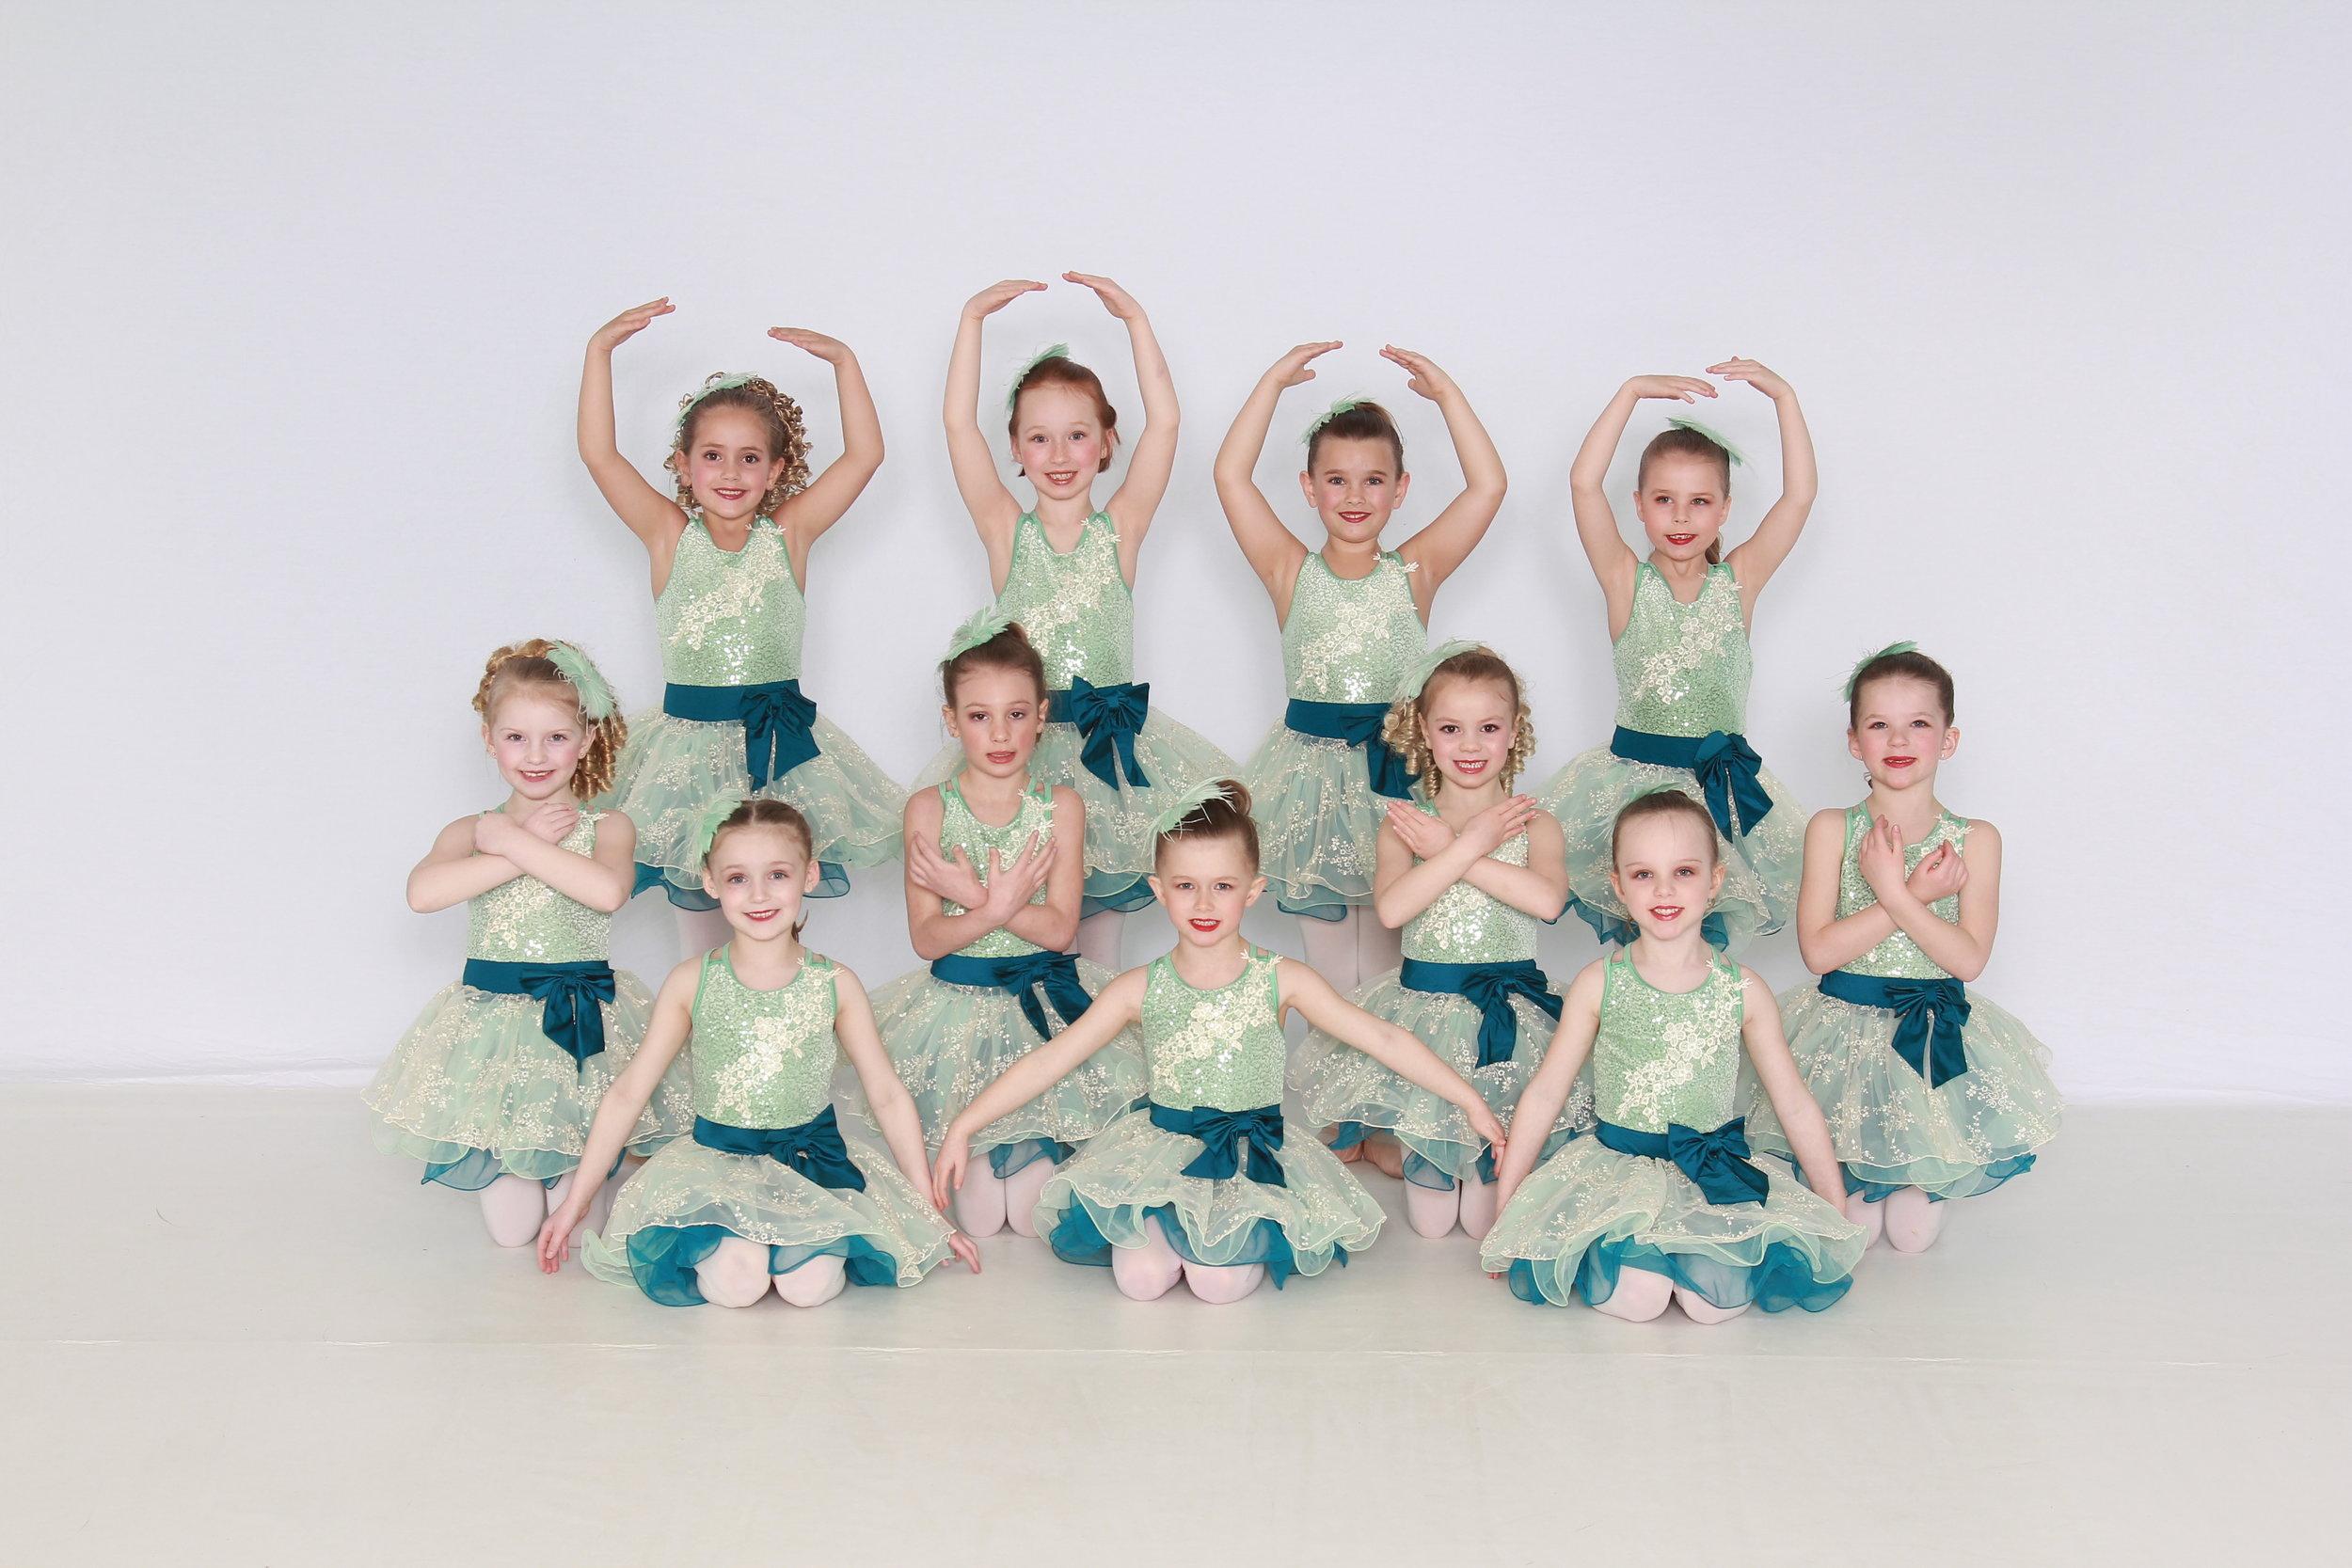 Ward School of Dance | Spruce Grove Dance Studio